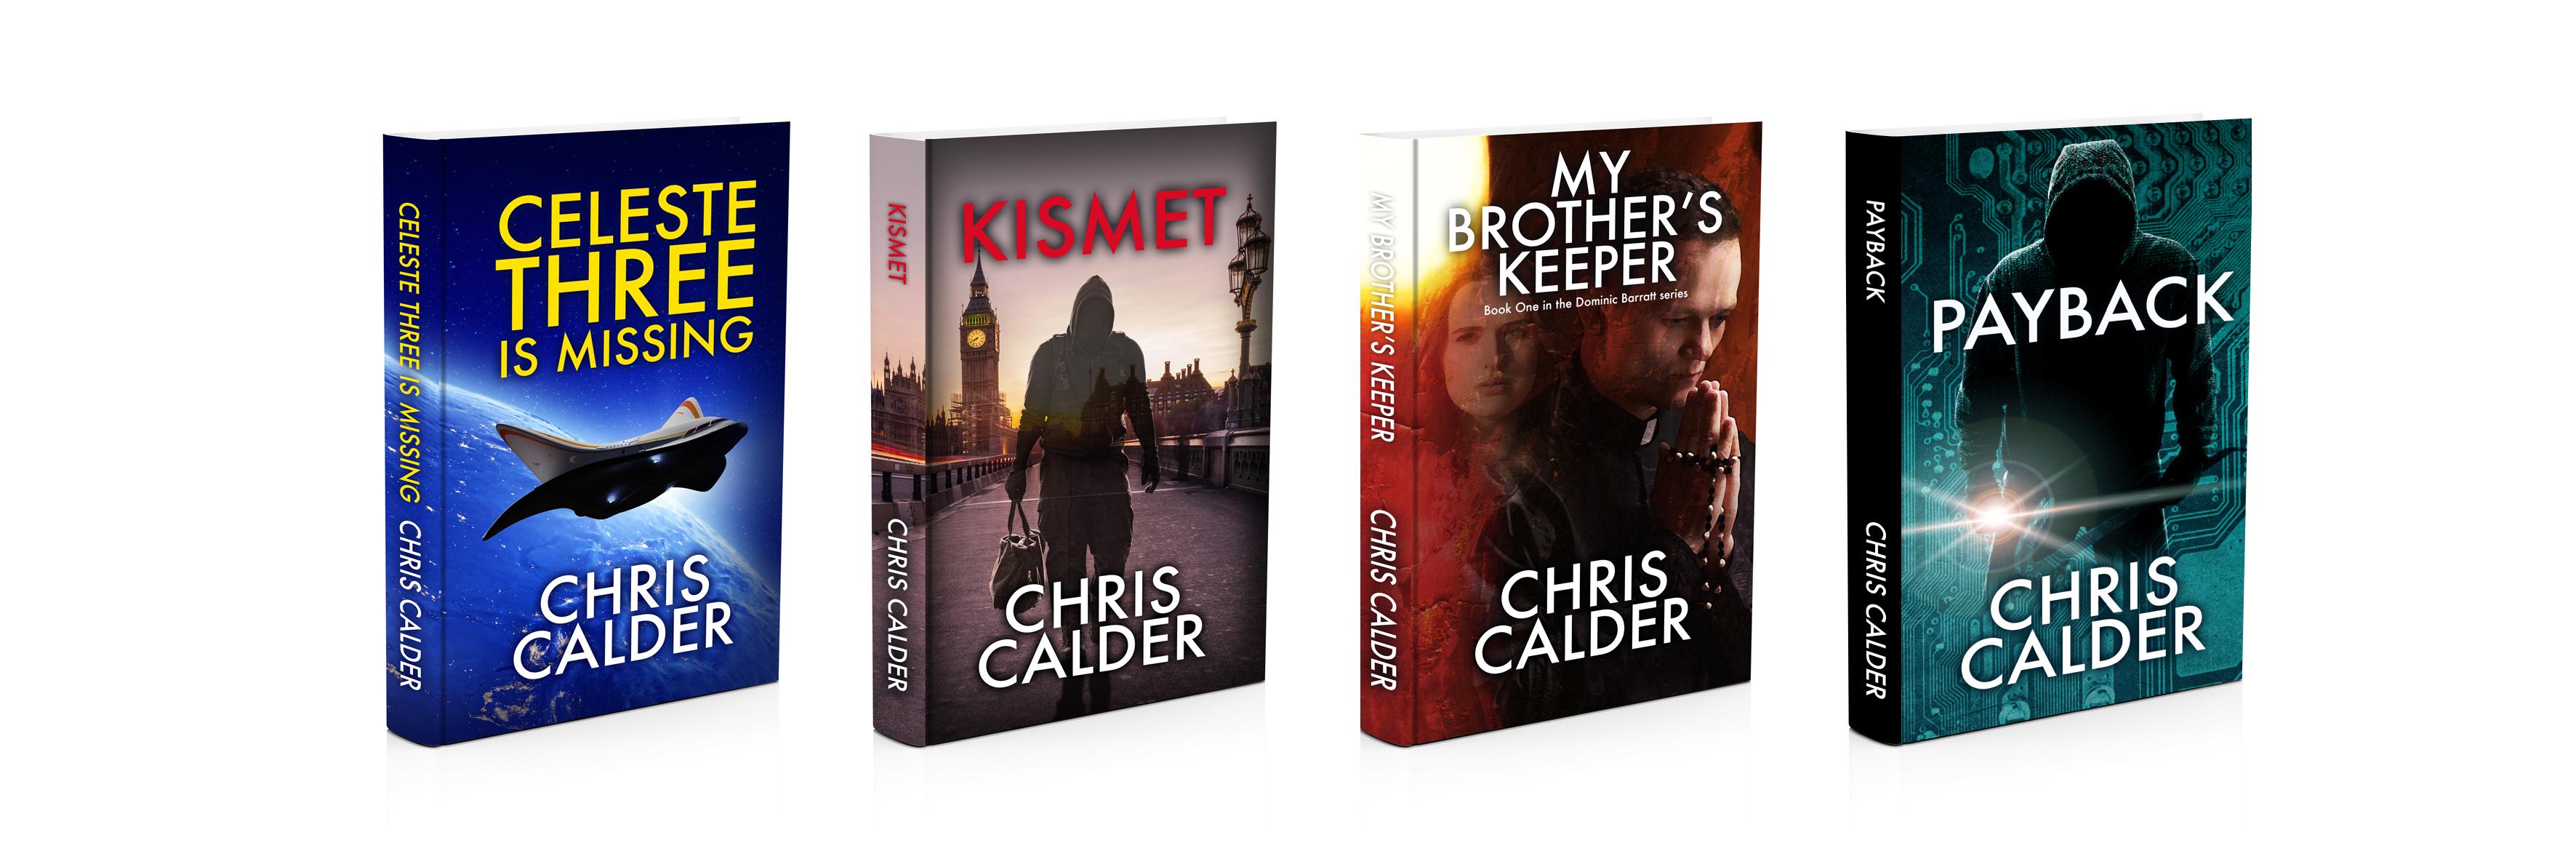 Books by Chris Calder